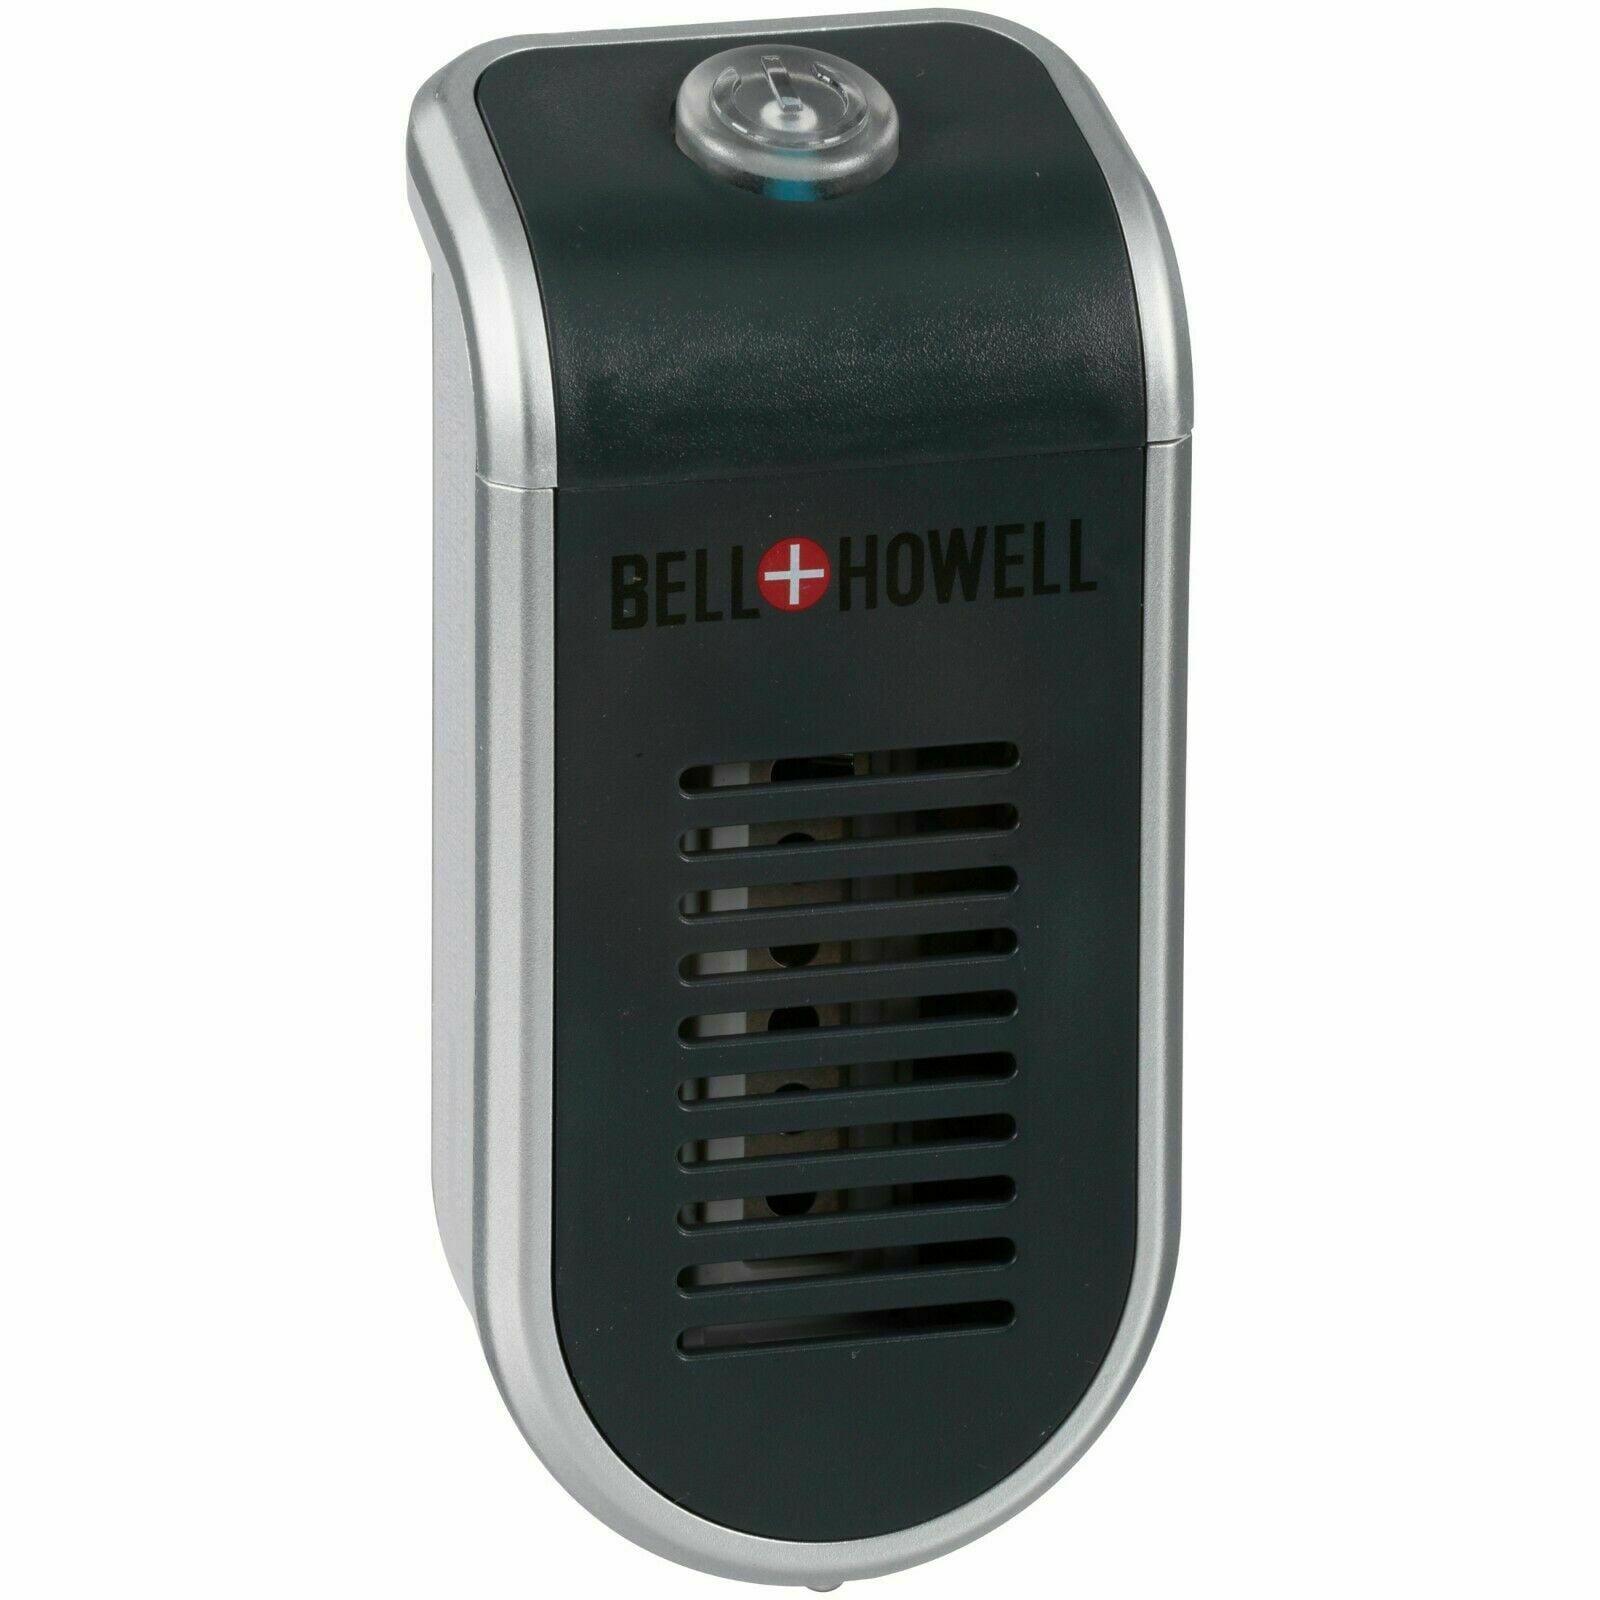 Bell Howell Ionic Maxx Air Purifier & Ionizer